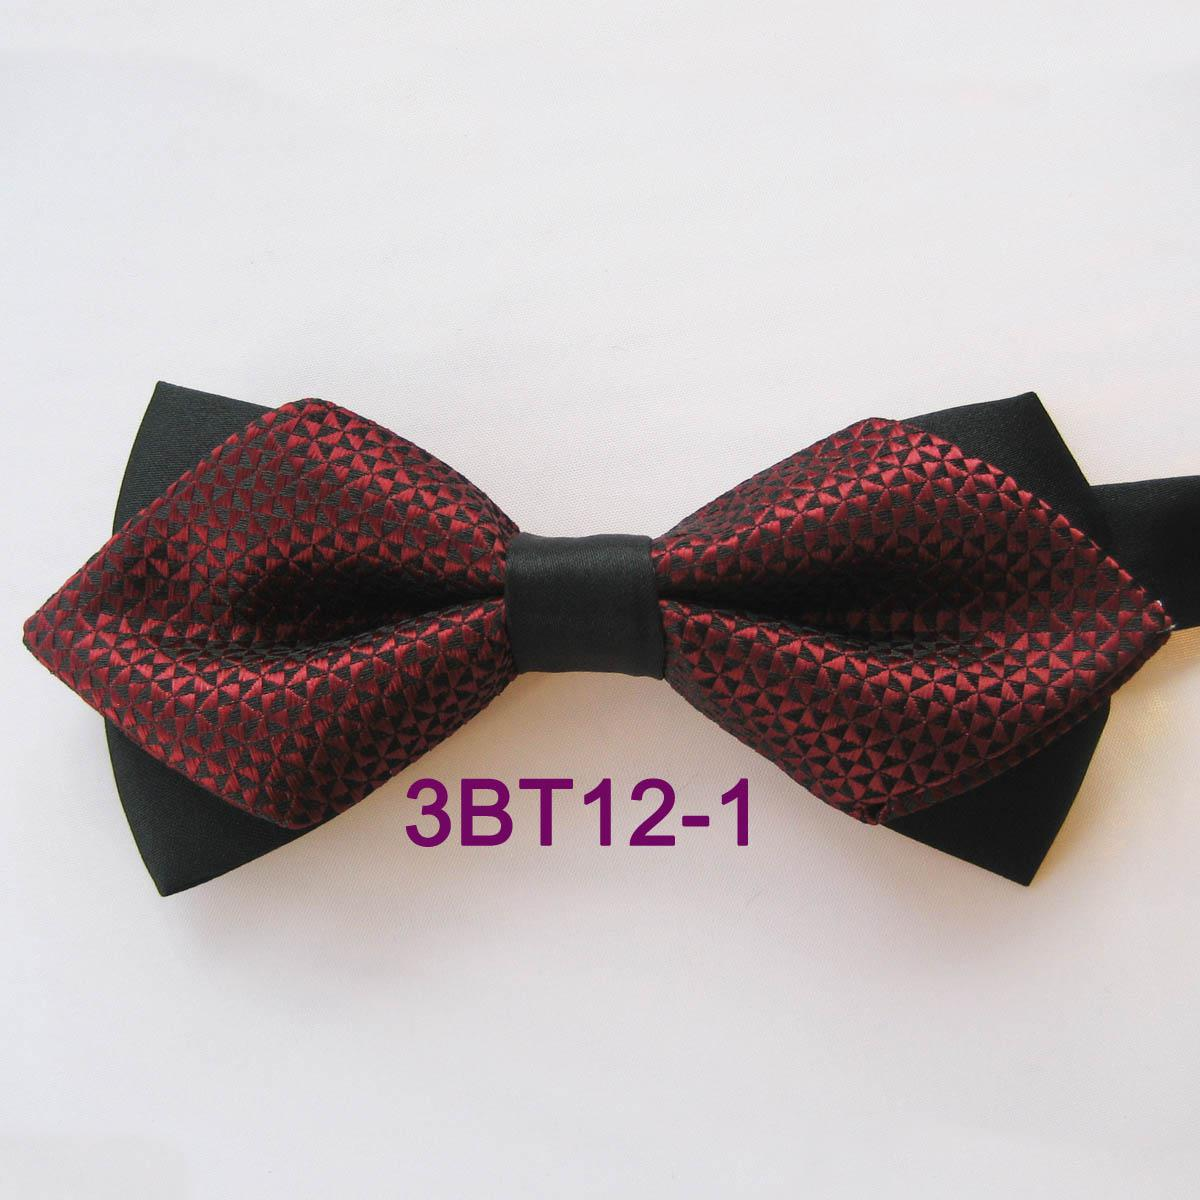 New Men/'s Two Tones Pre-tied Bow Tie /& Hankie Set Burgundy Black formal